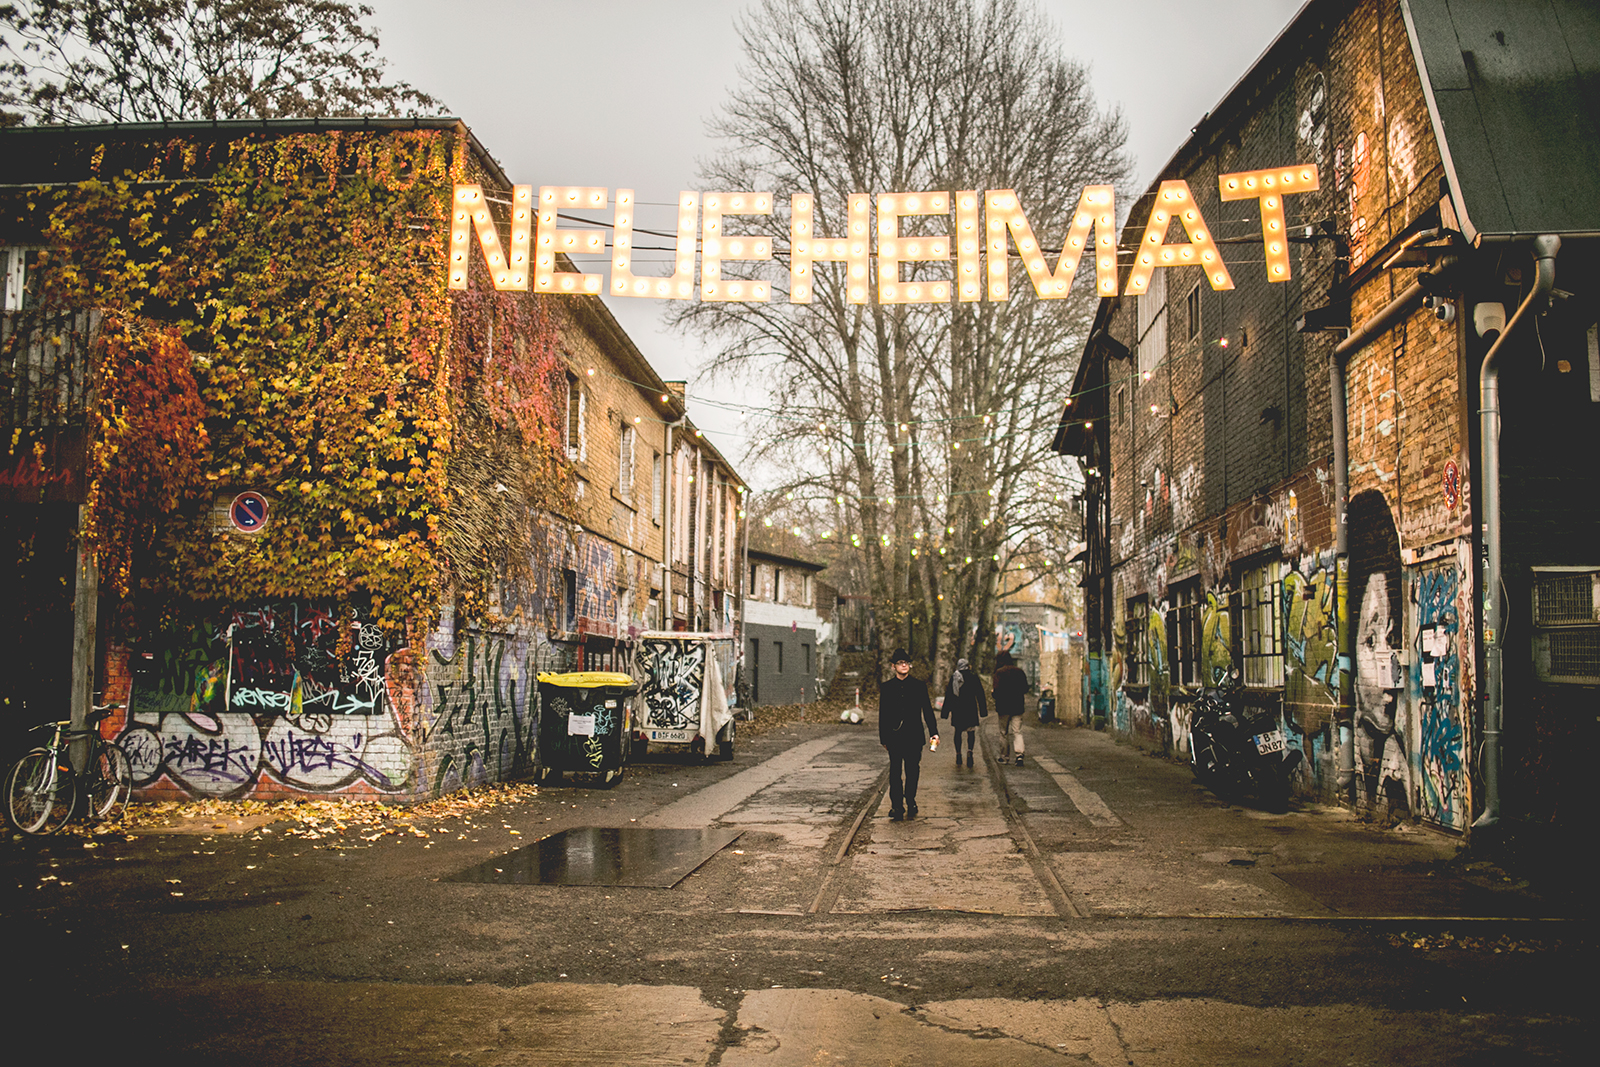 Village Market, Neue Heimat, Berlin – Unfolded